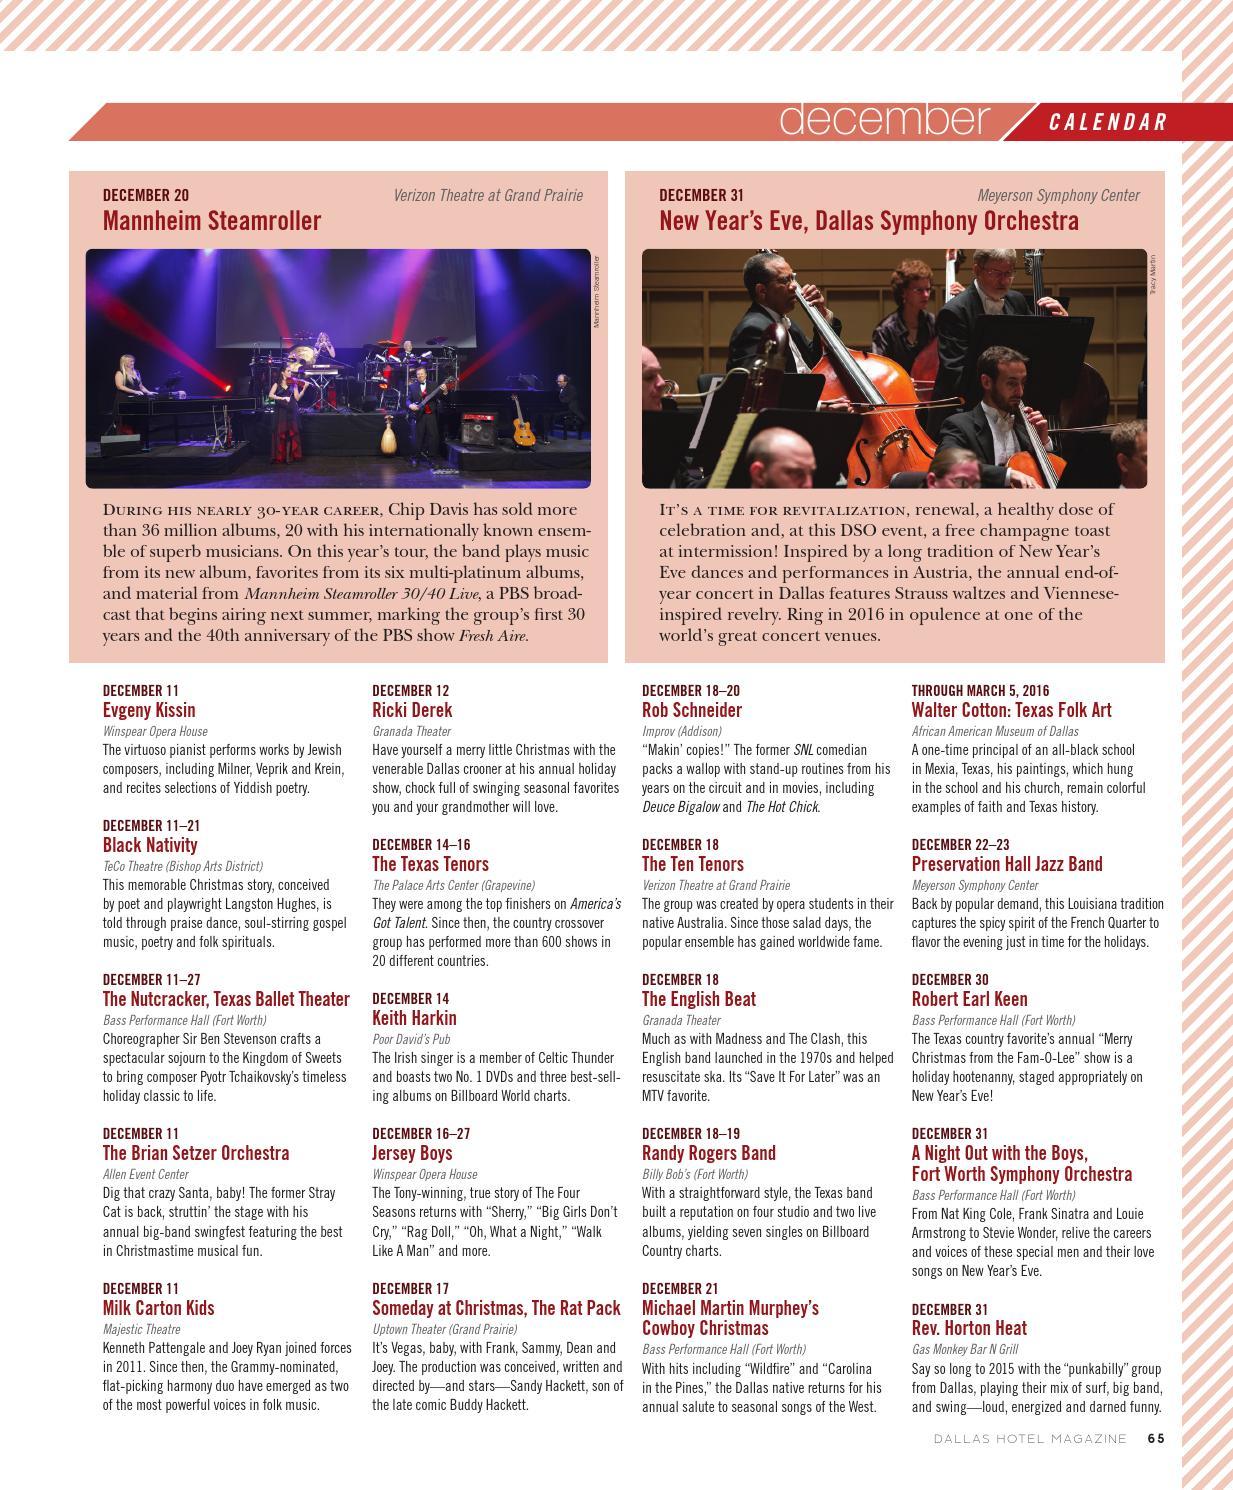 Dallas Hotel Magazine - Fall + Holiday 2015 by Dallas Hotel Magazine ...